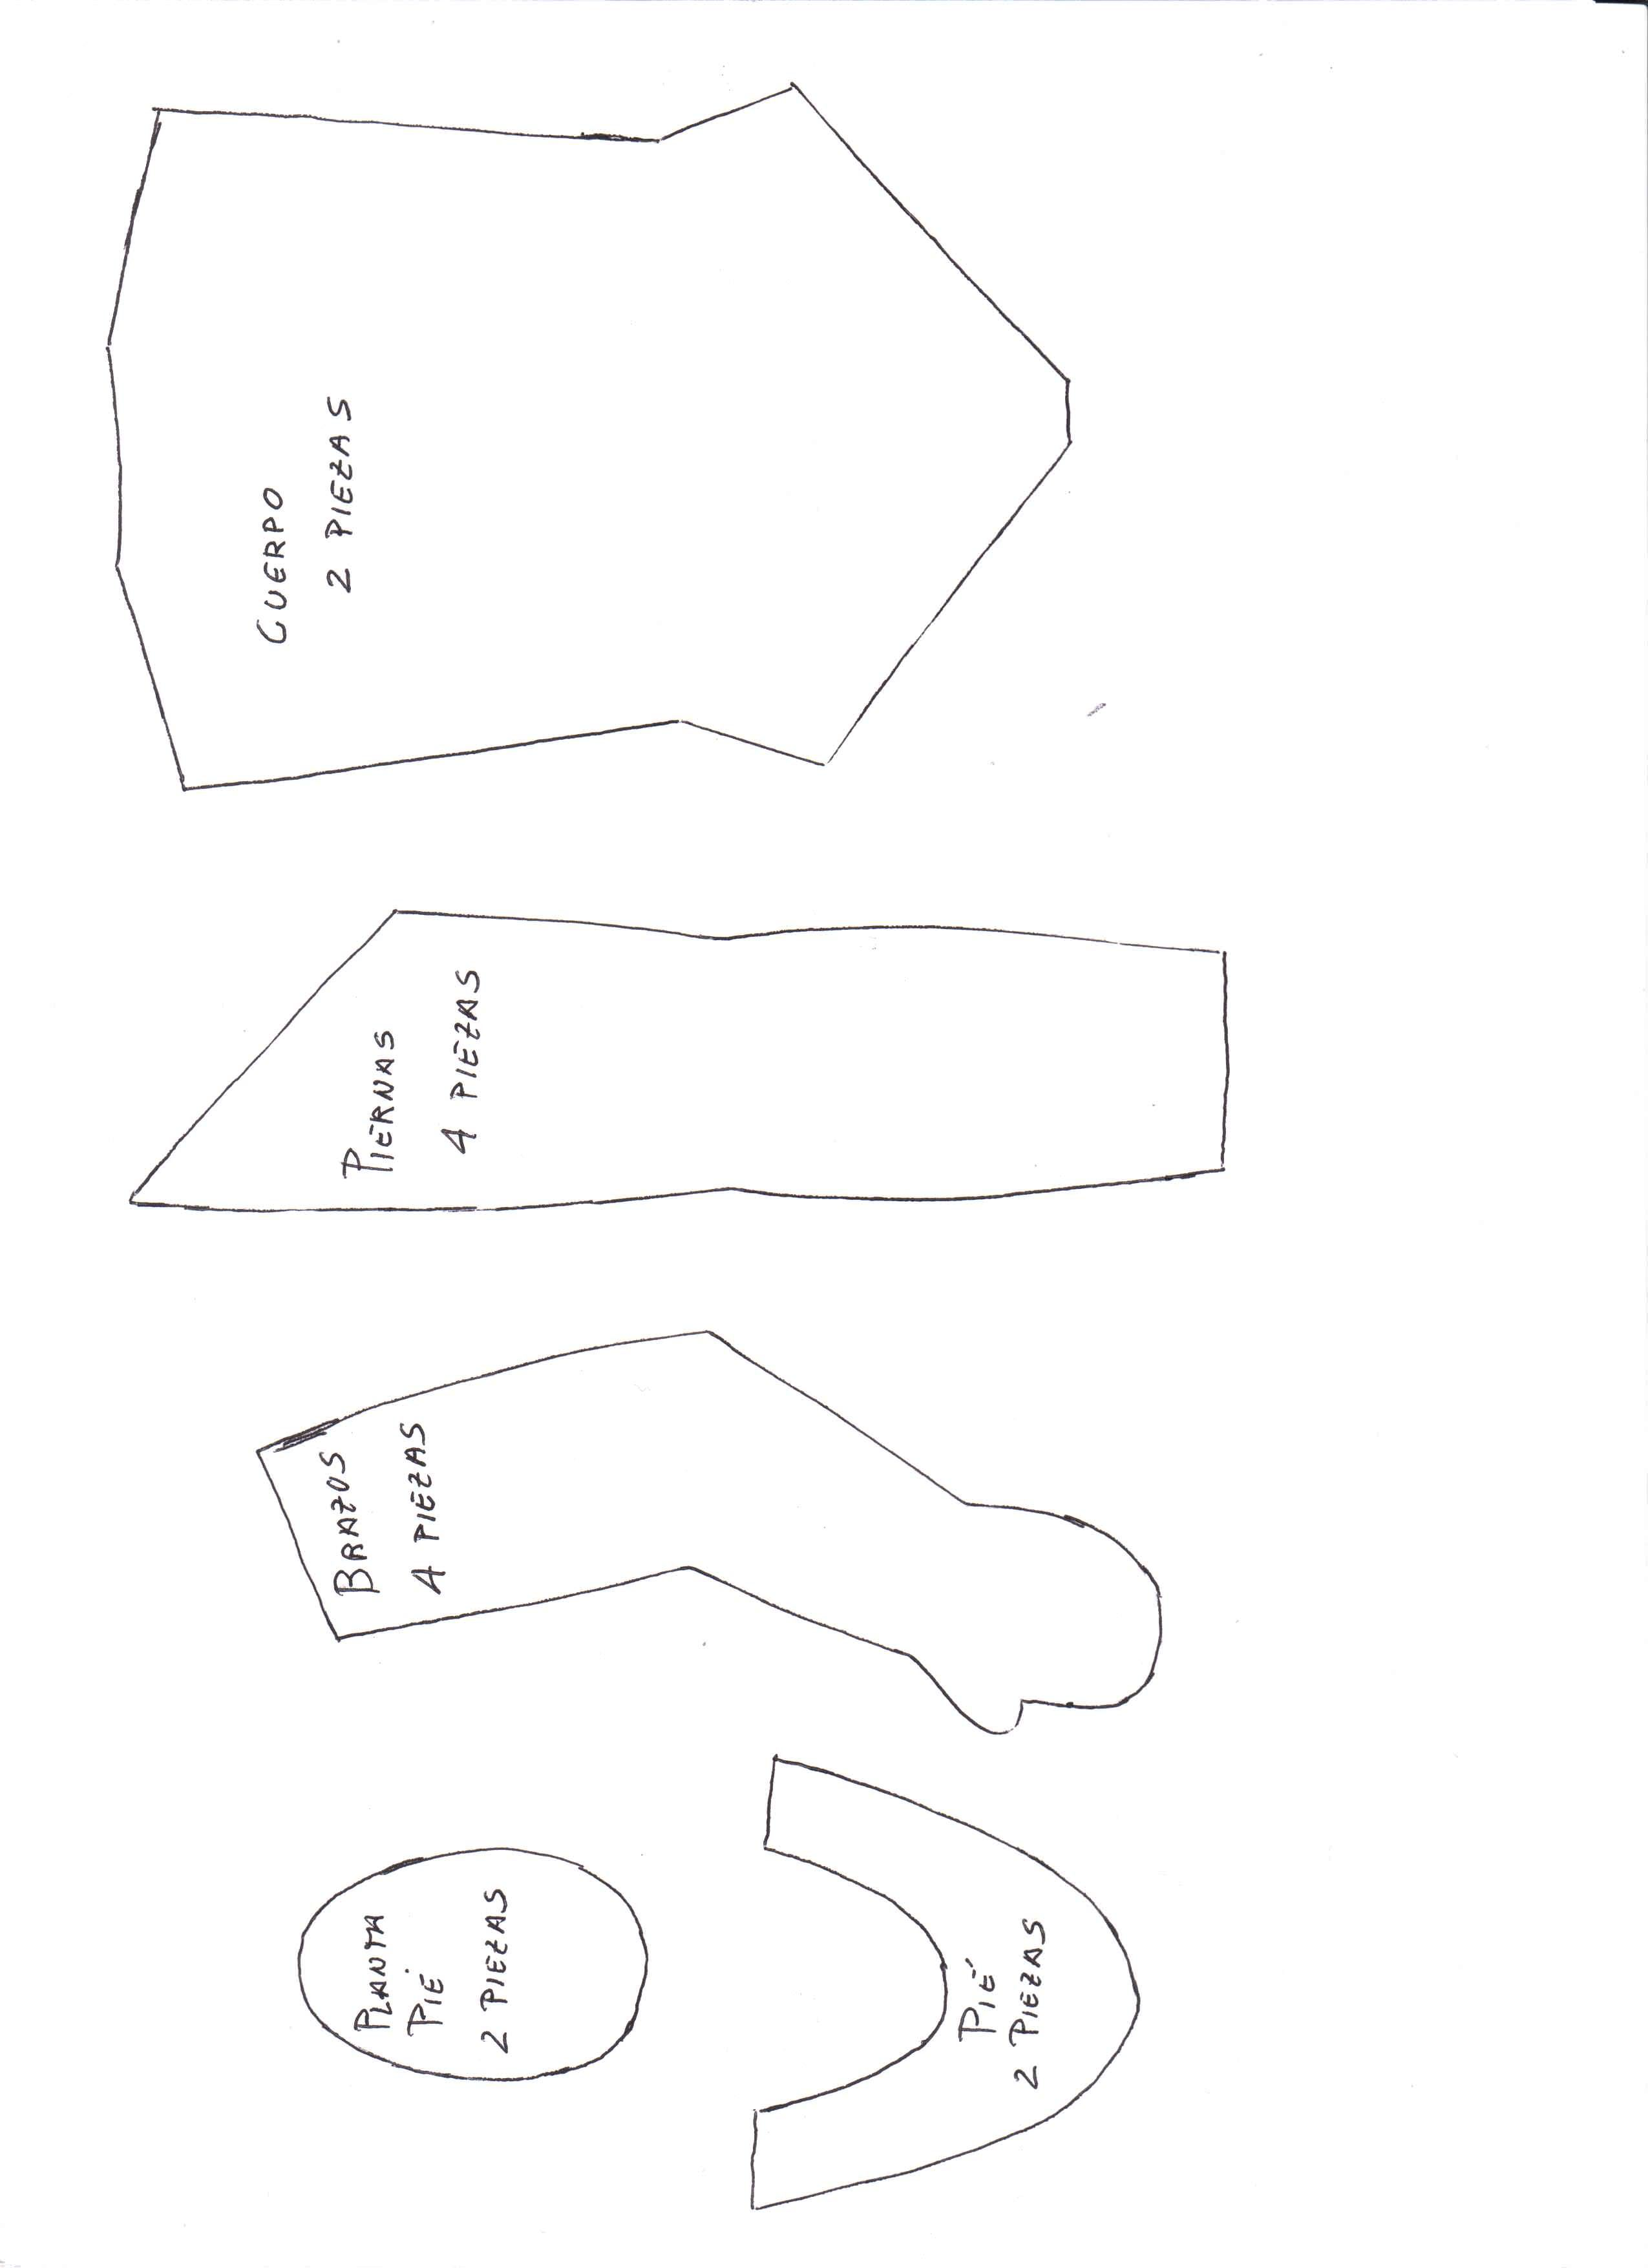 Patrones e instrucciones paso a paso para coser una muñeca de trapo ...